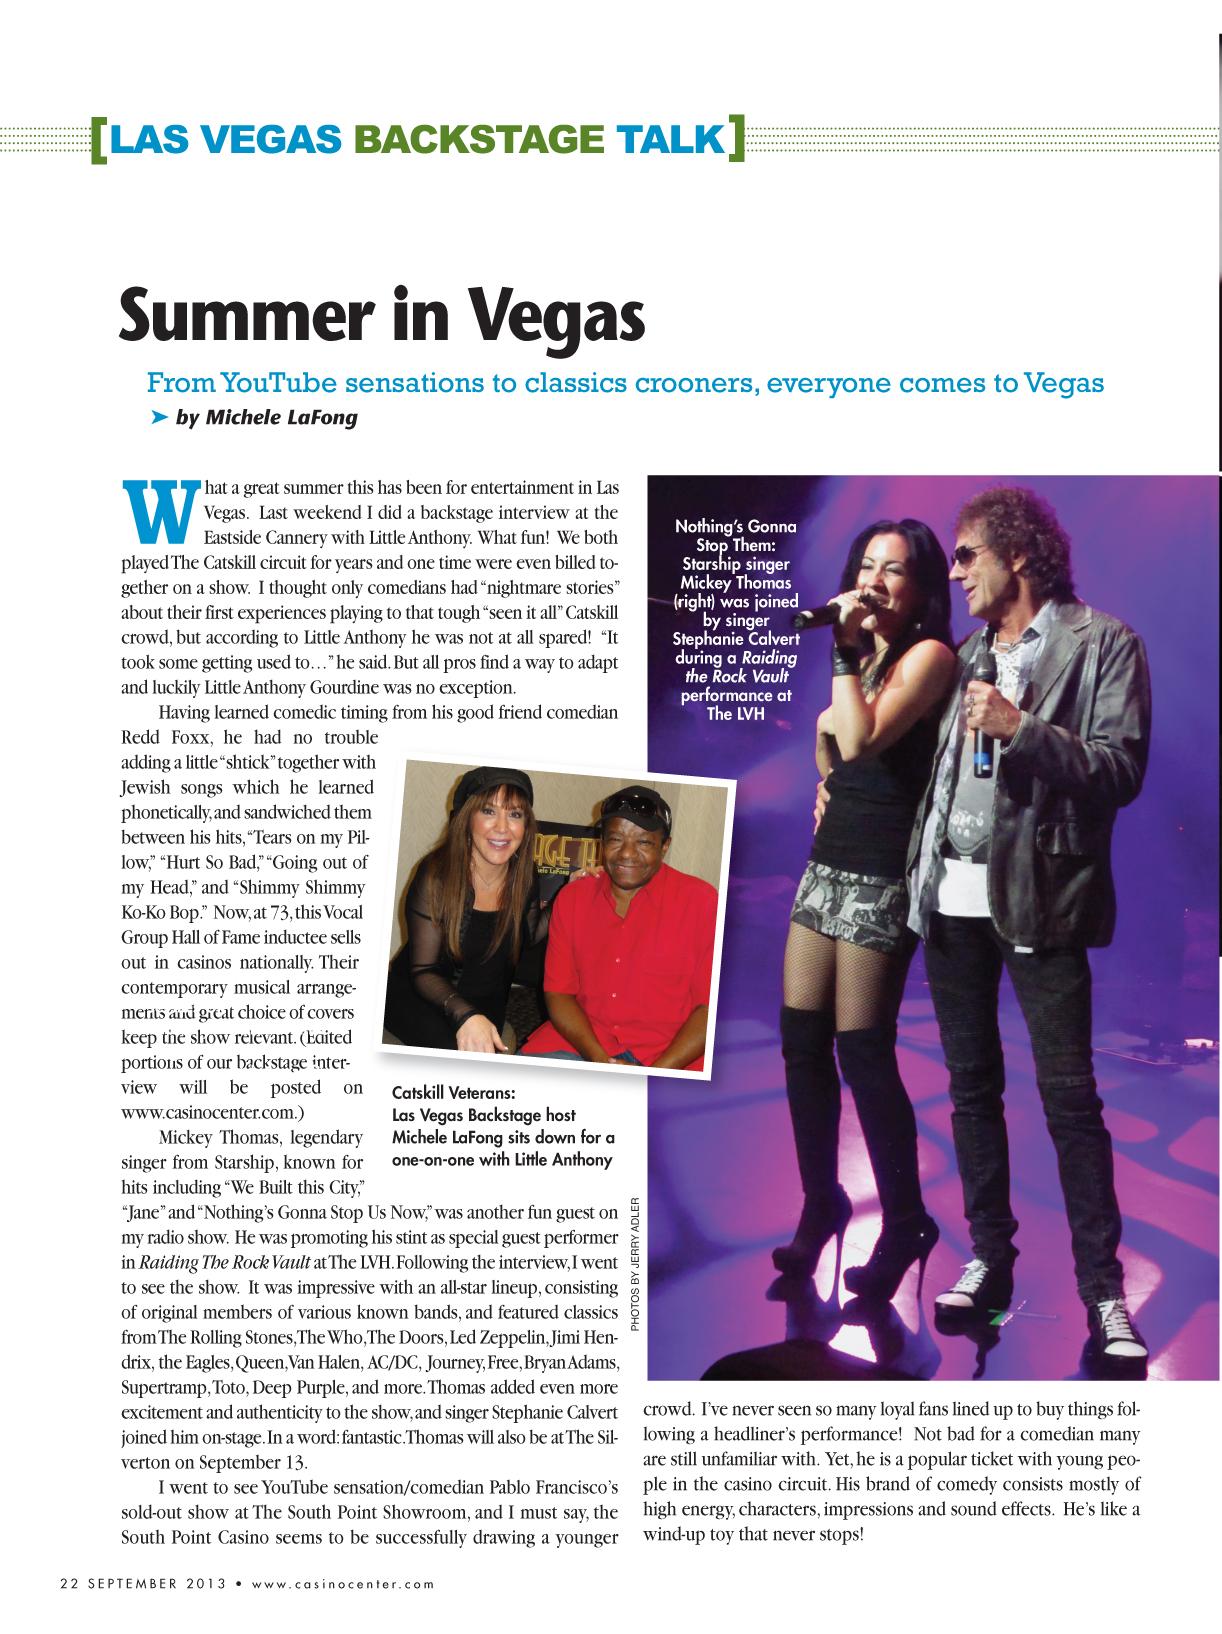 Vegas Casino Talk